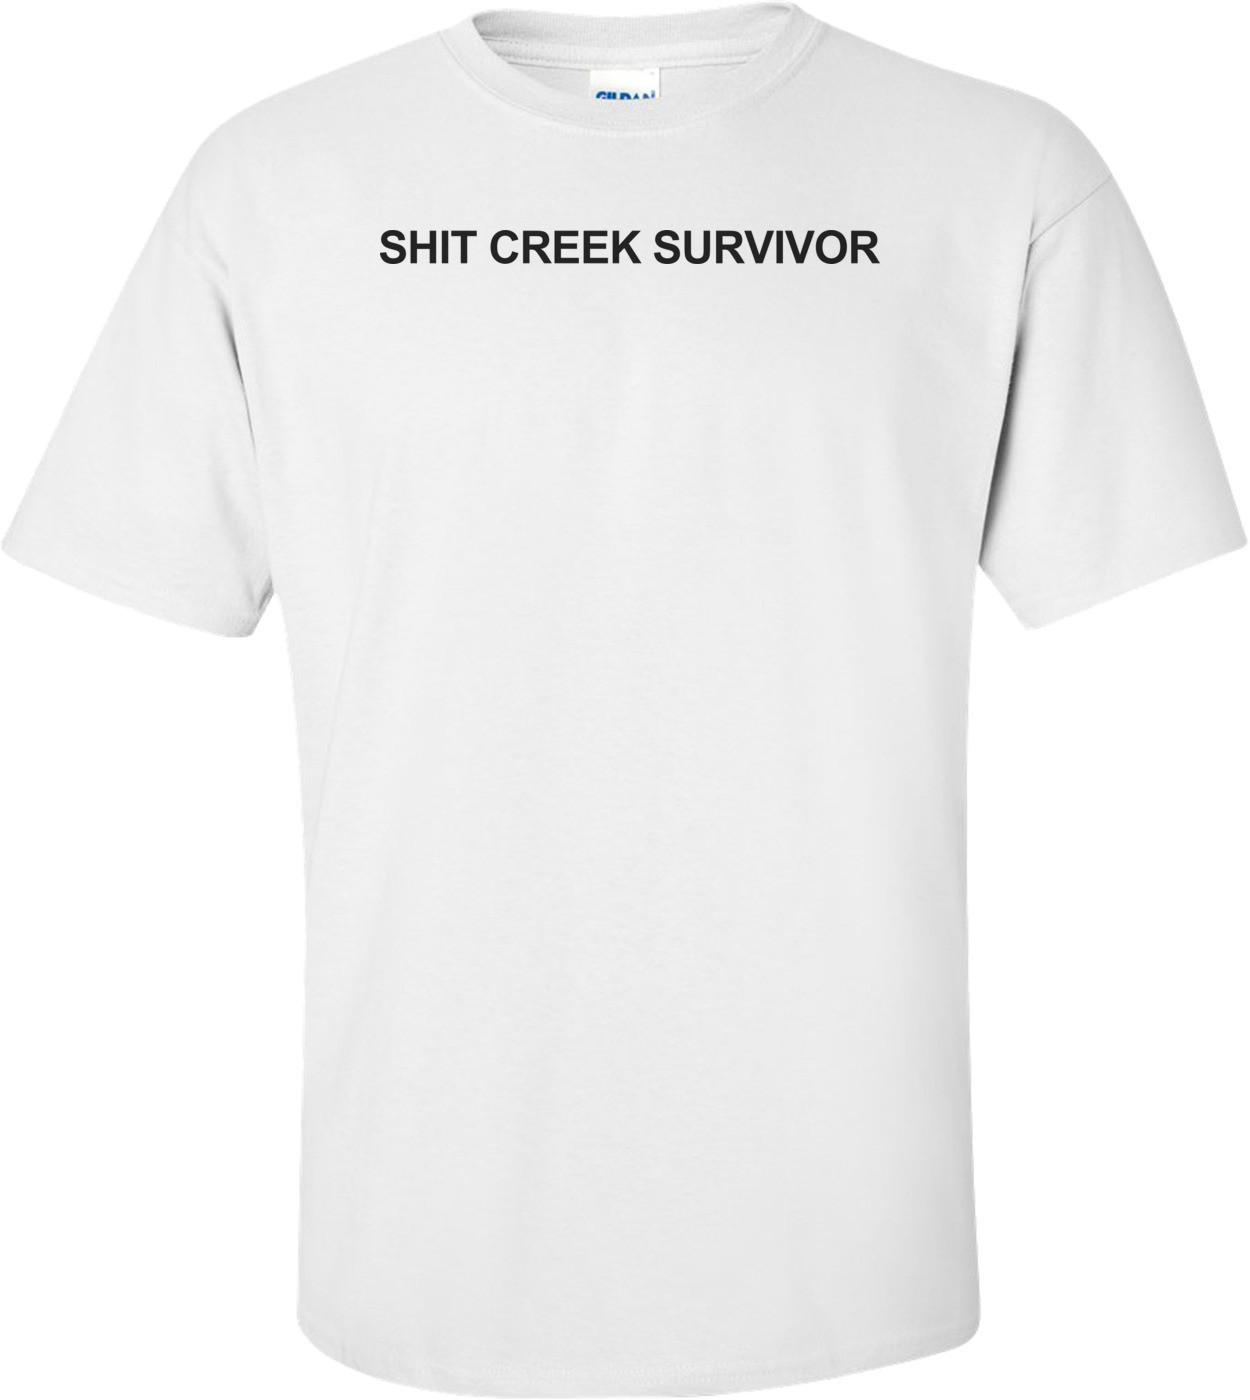 I Survived Shit Creek - Funny T-shirt